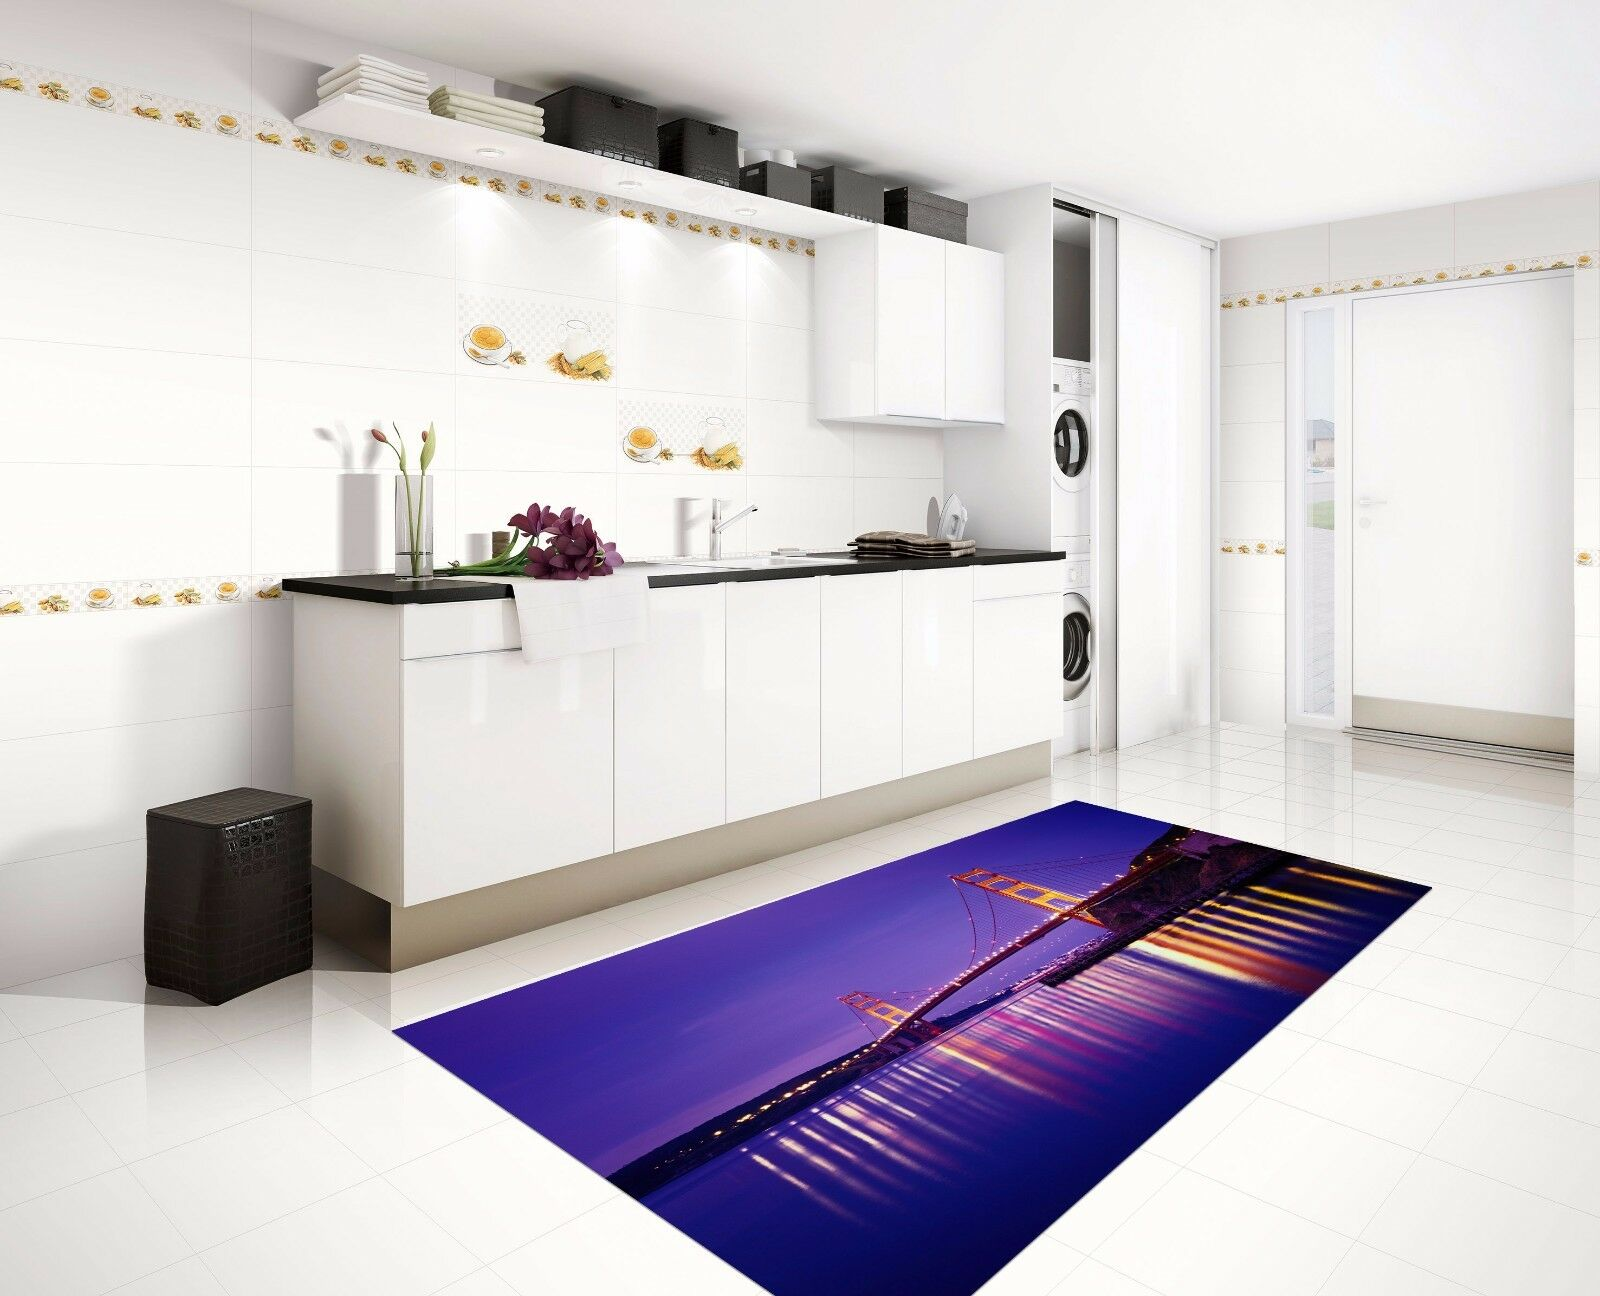 3D Sky Lake 522 Kitchen Mat Floor Murals Wall Print Wall AJ WALLPAPER AU Kyra